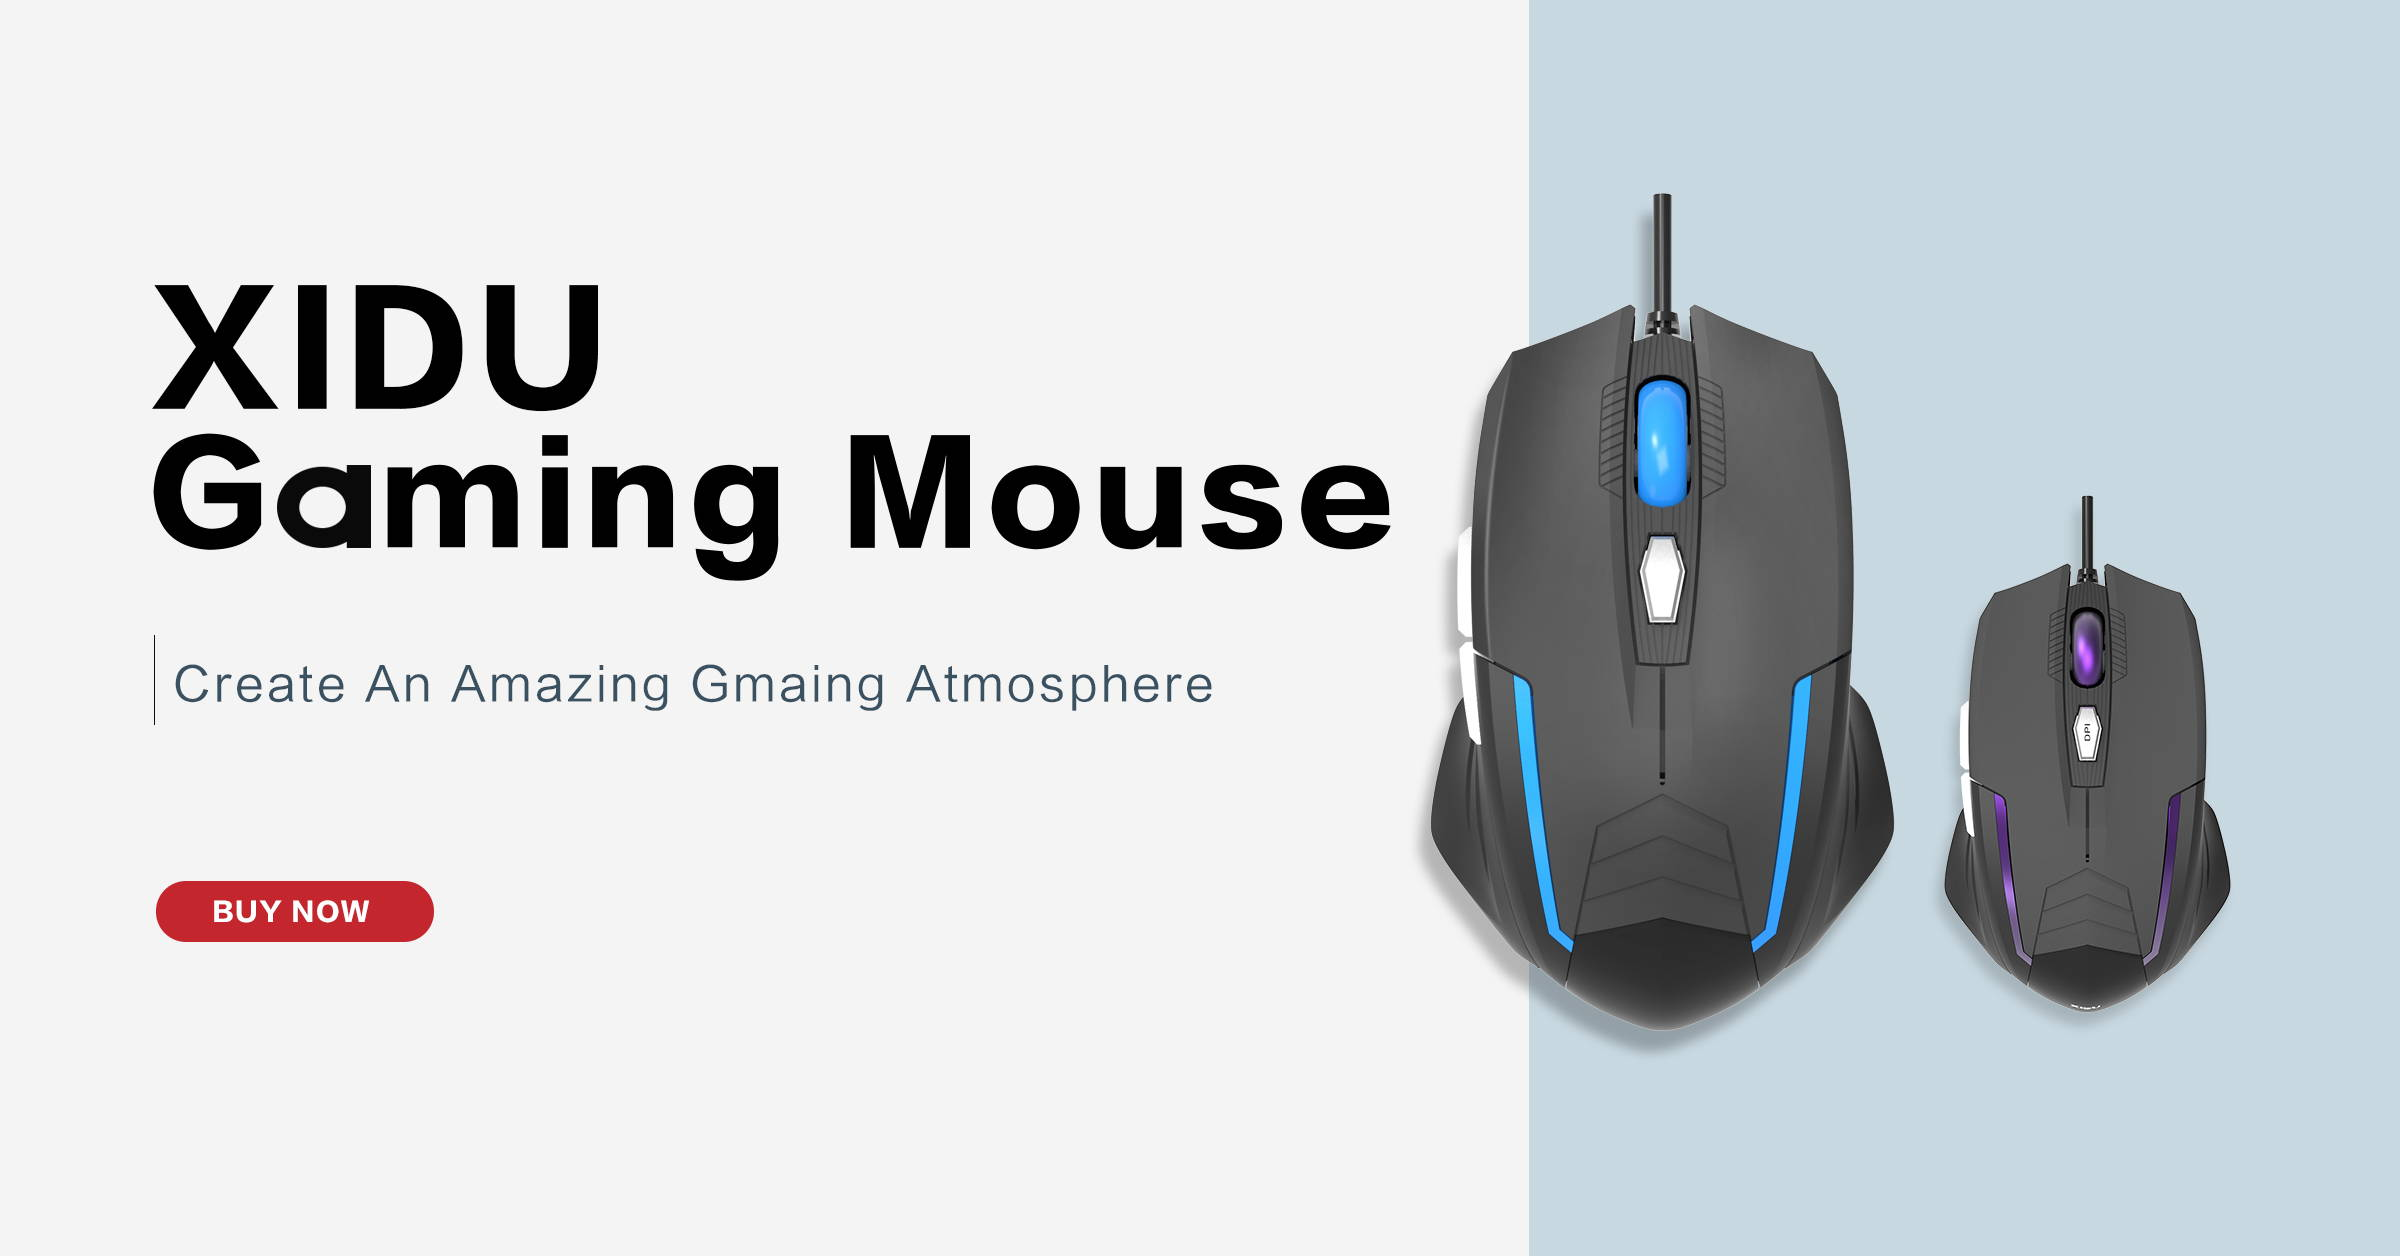 XIDU Gaming Mouse